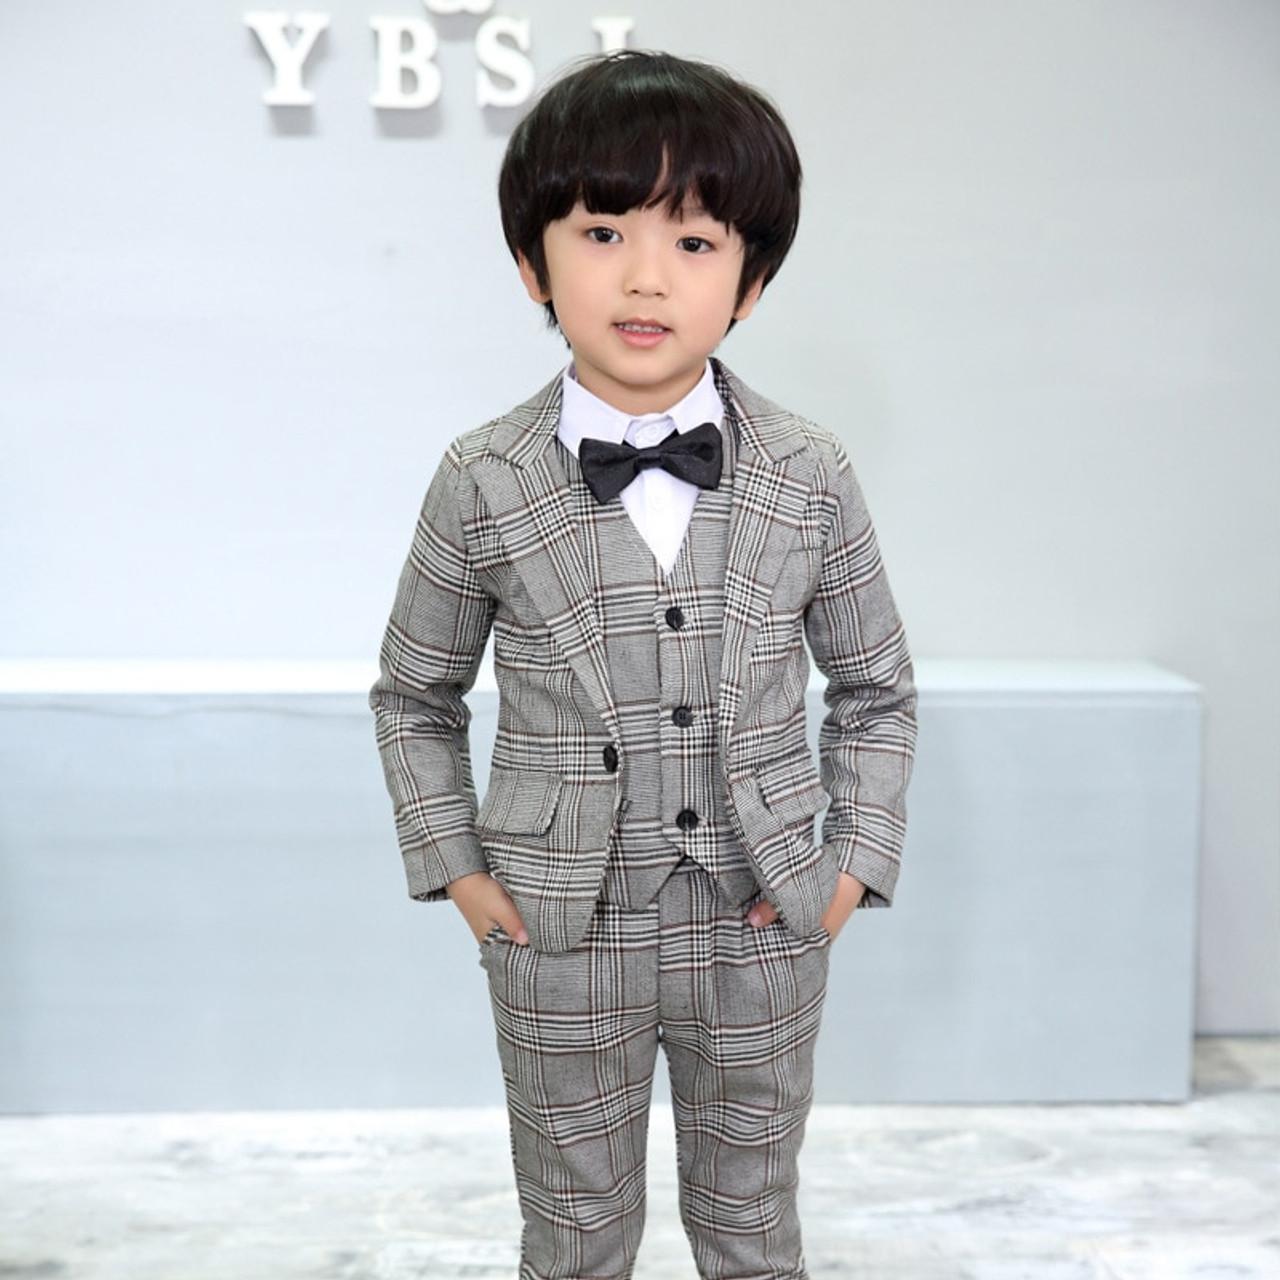 69ed75ce5 ... Flower Boys Formal School Suits for Weddings Boys Brand Plaid Blazer  Vest Pants 3pcs Tuxedo Kids ...